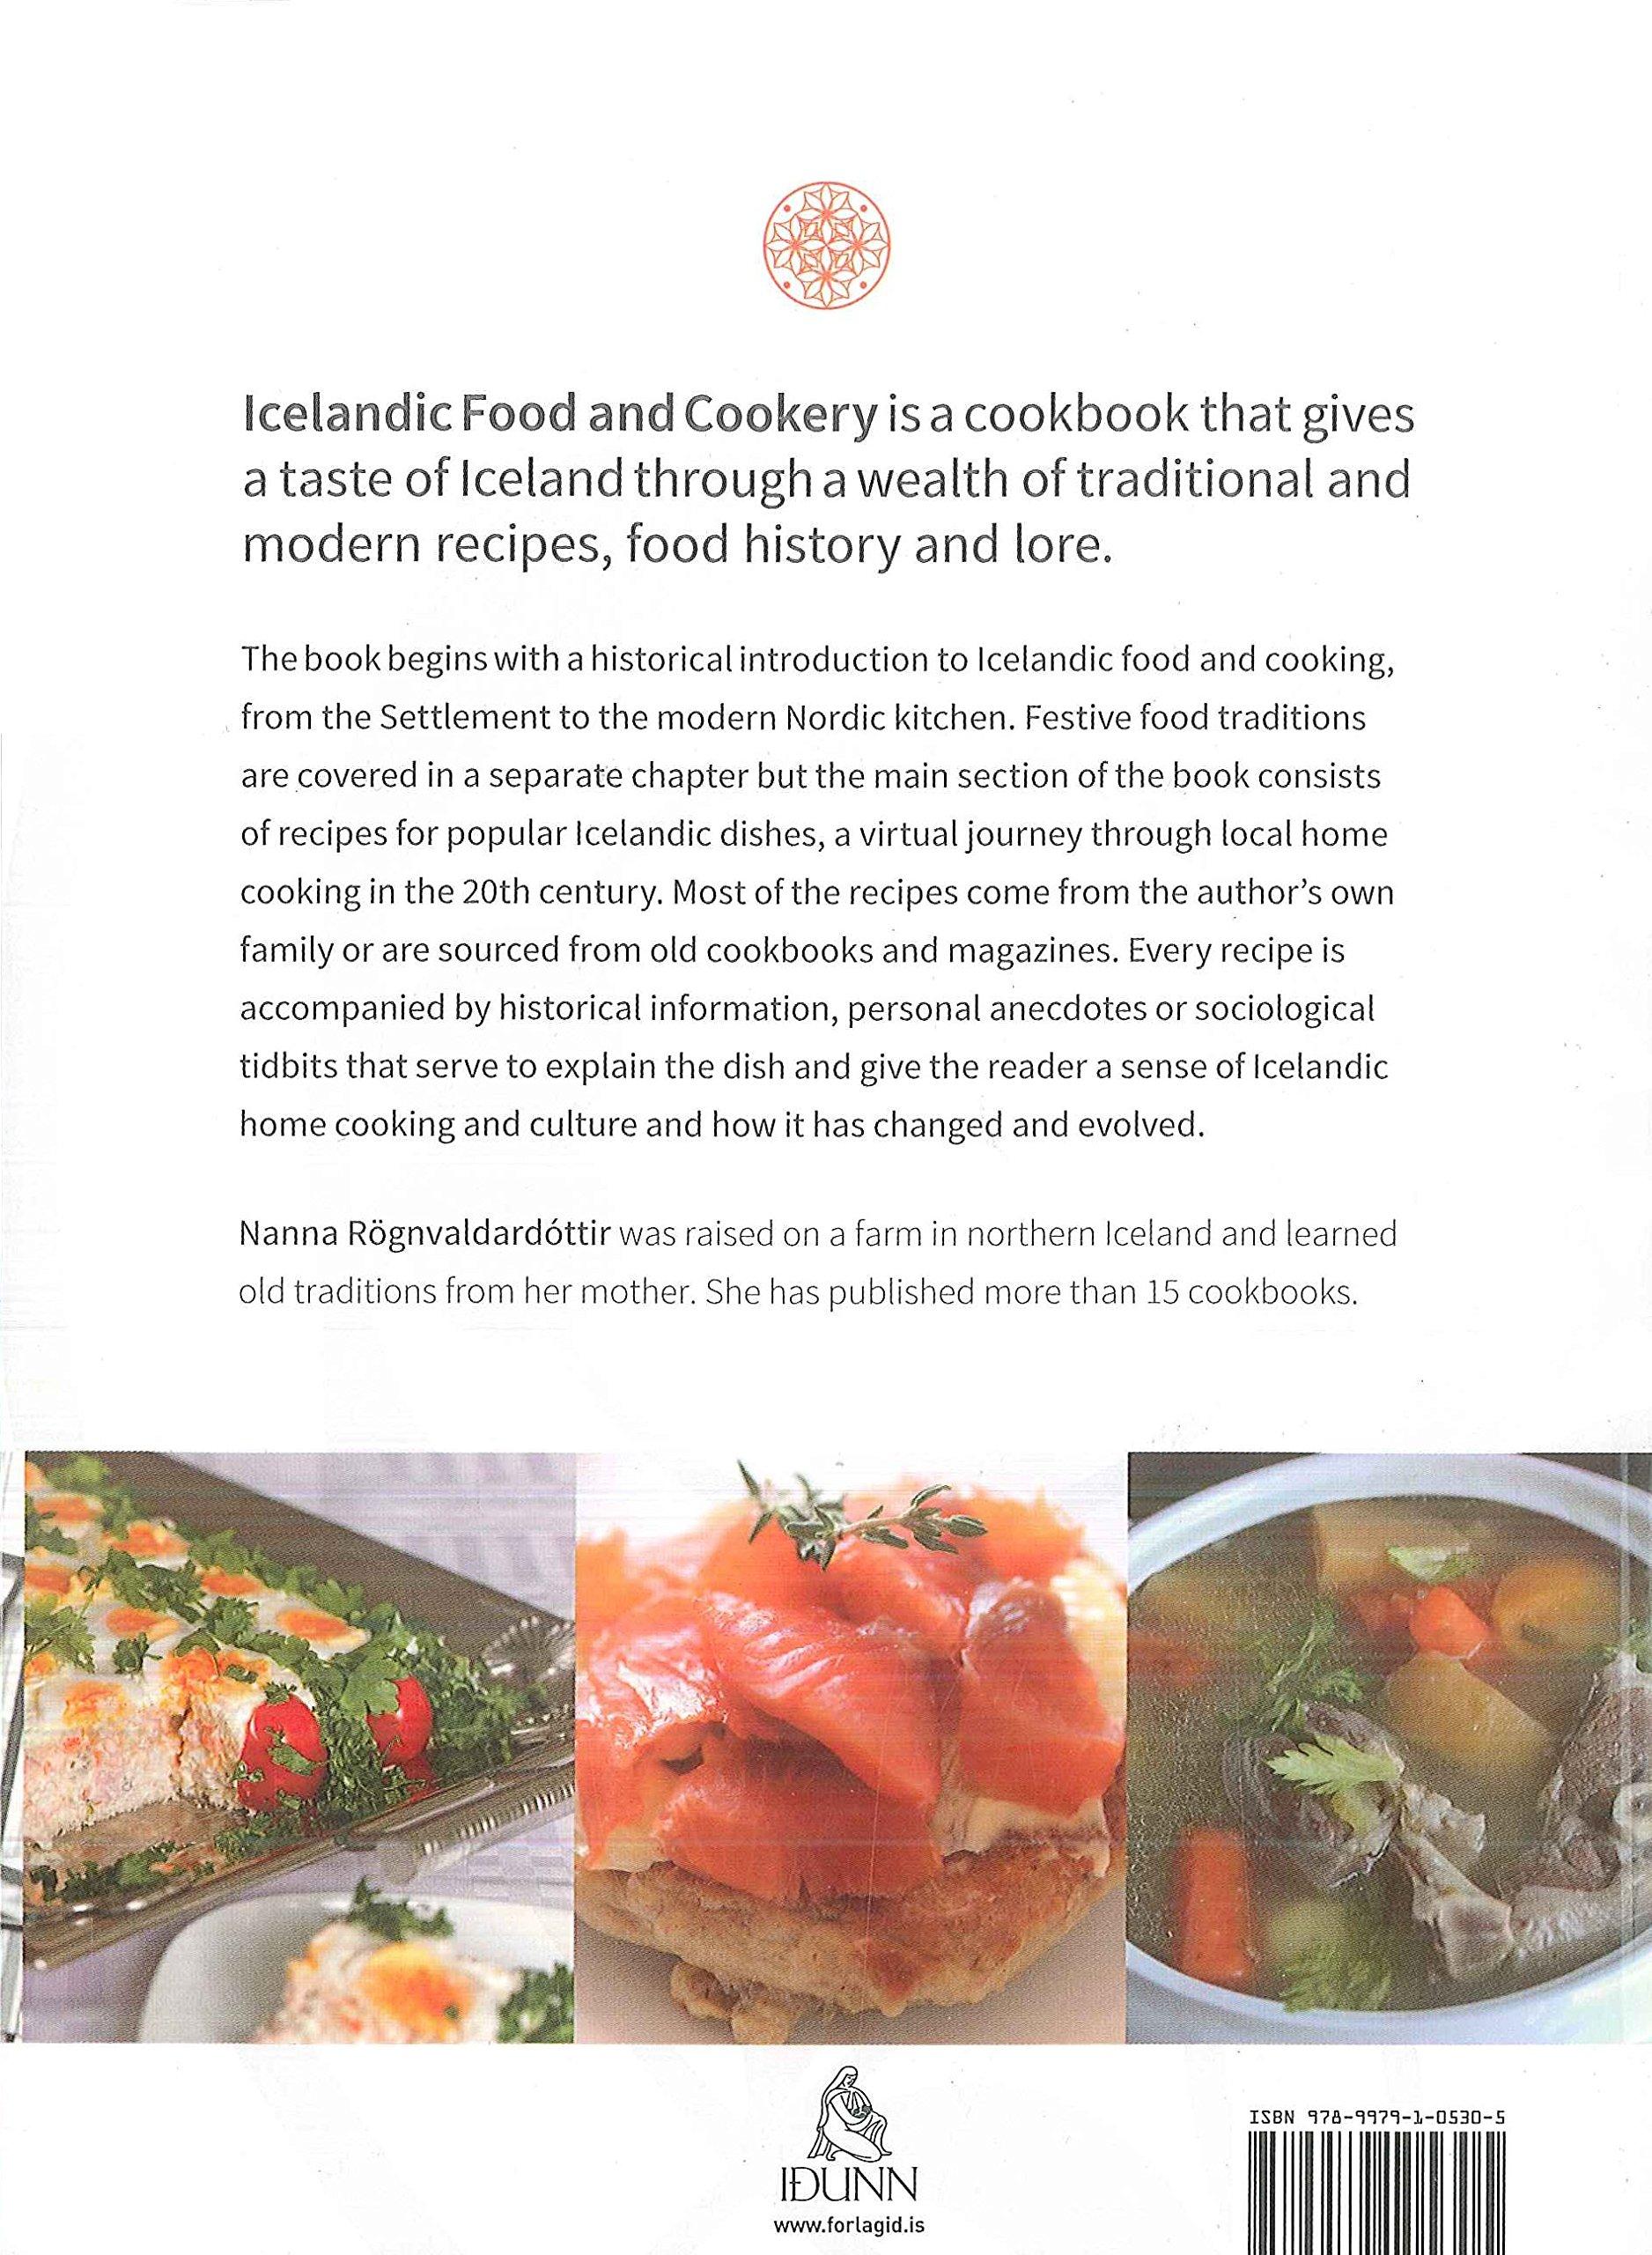 Icelandic Food and Cookery: Amazon.co.uk: Rögnvaldardóttir, Nanna ...